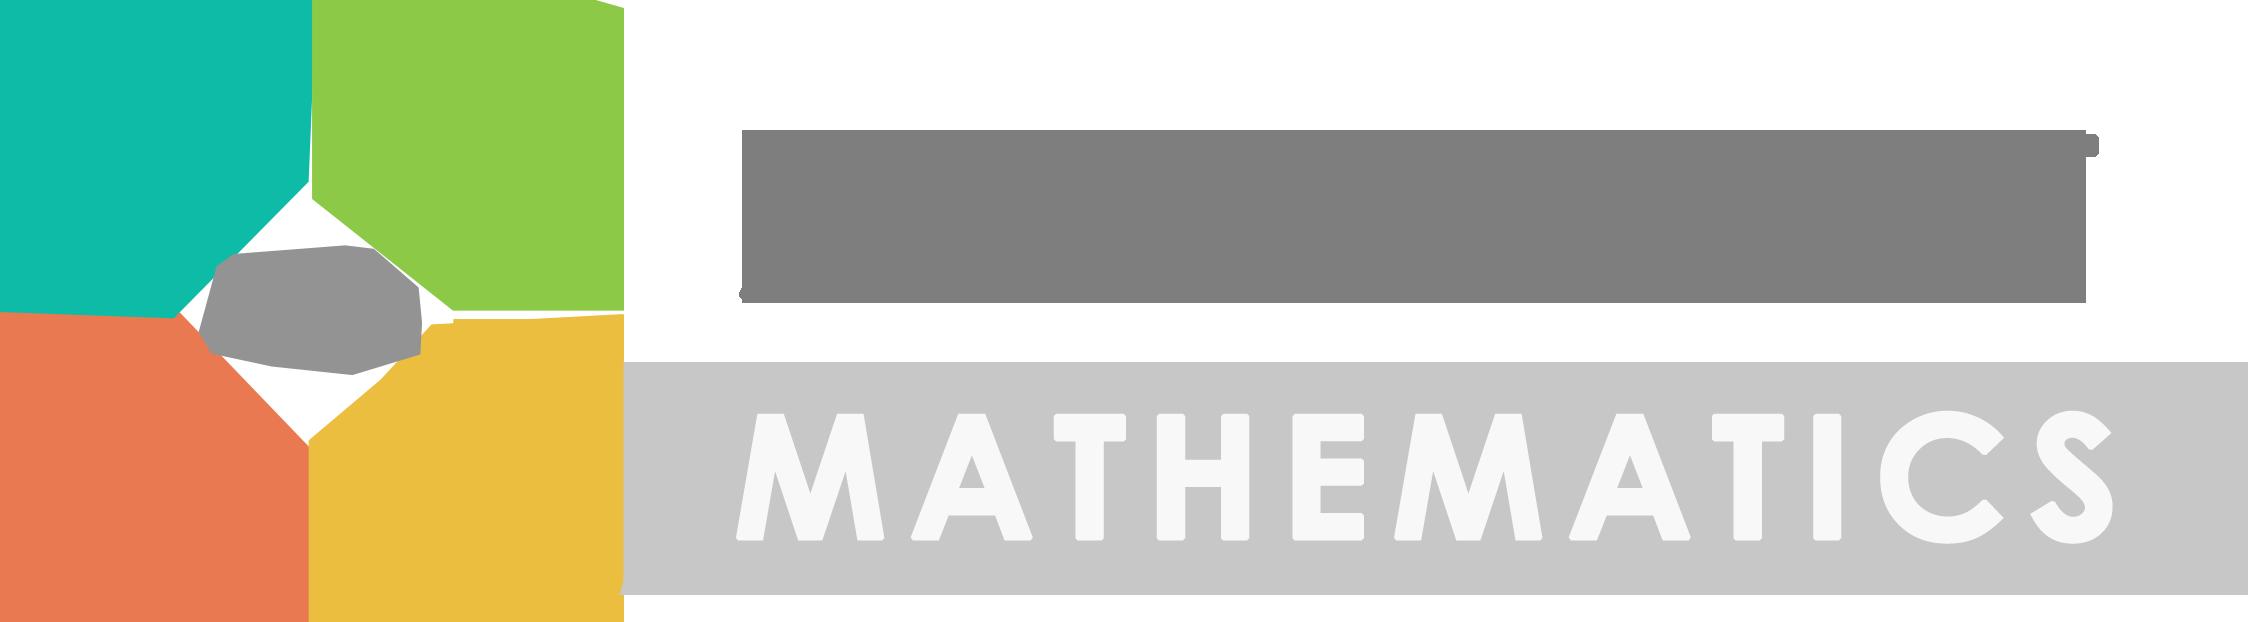 All About Mathematics